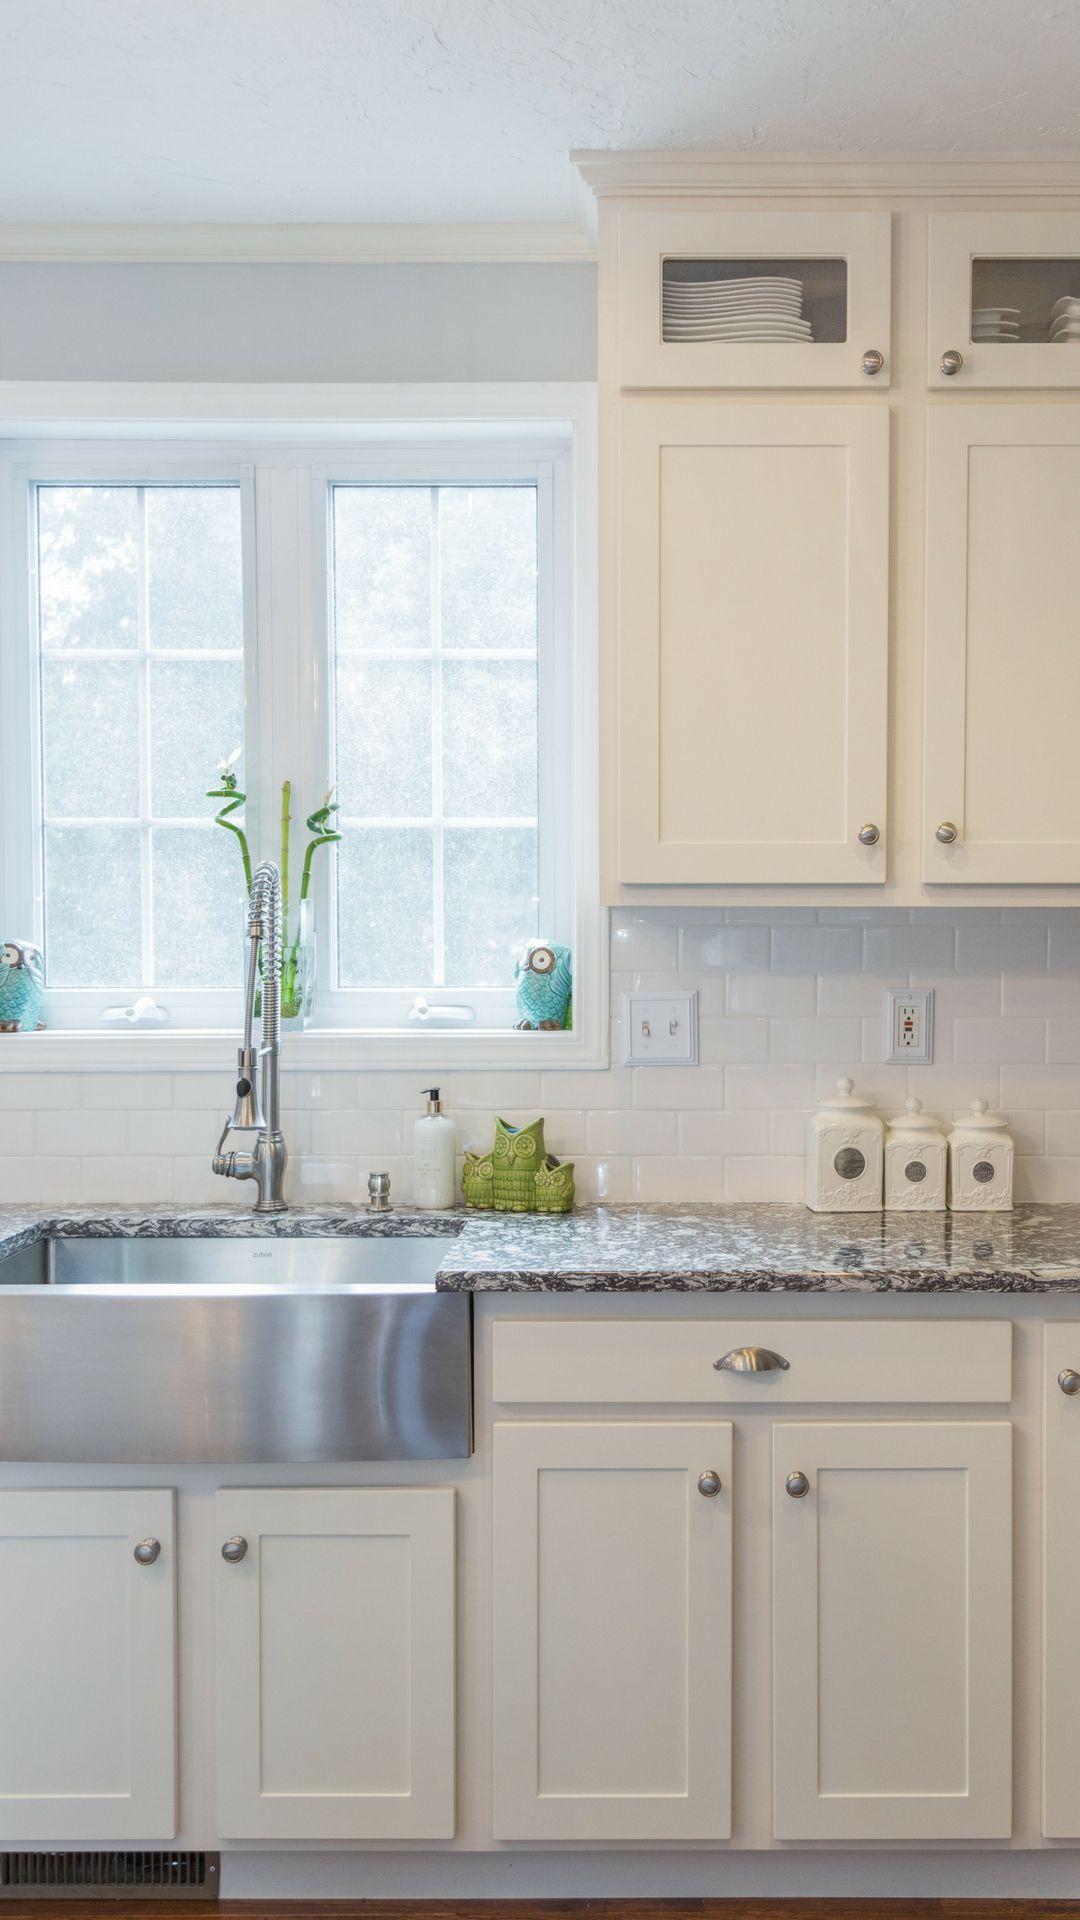 Kitchen Magic Cabinet Refacing: Cabinets in Antique White, Cambria ...